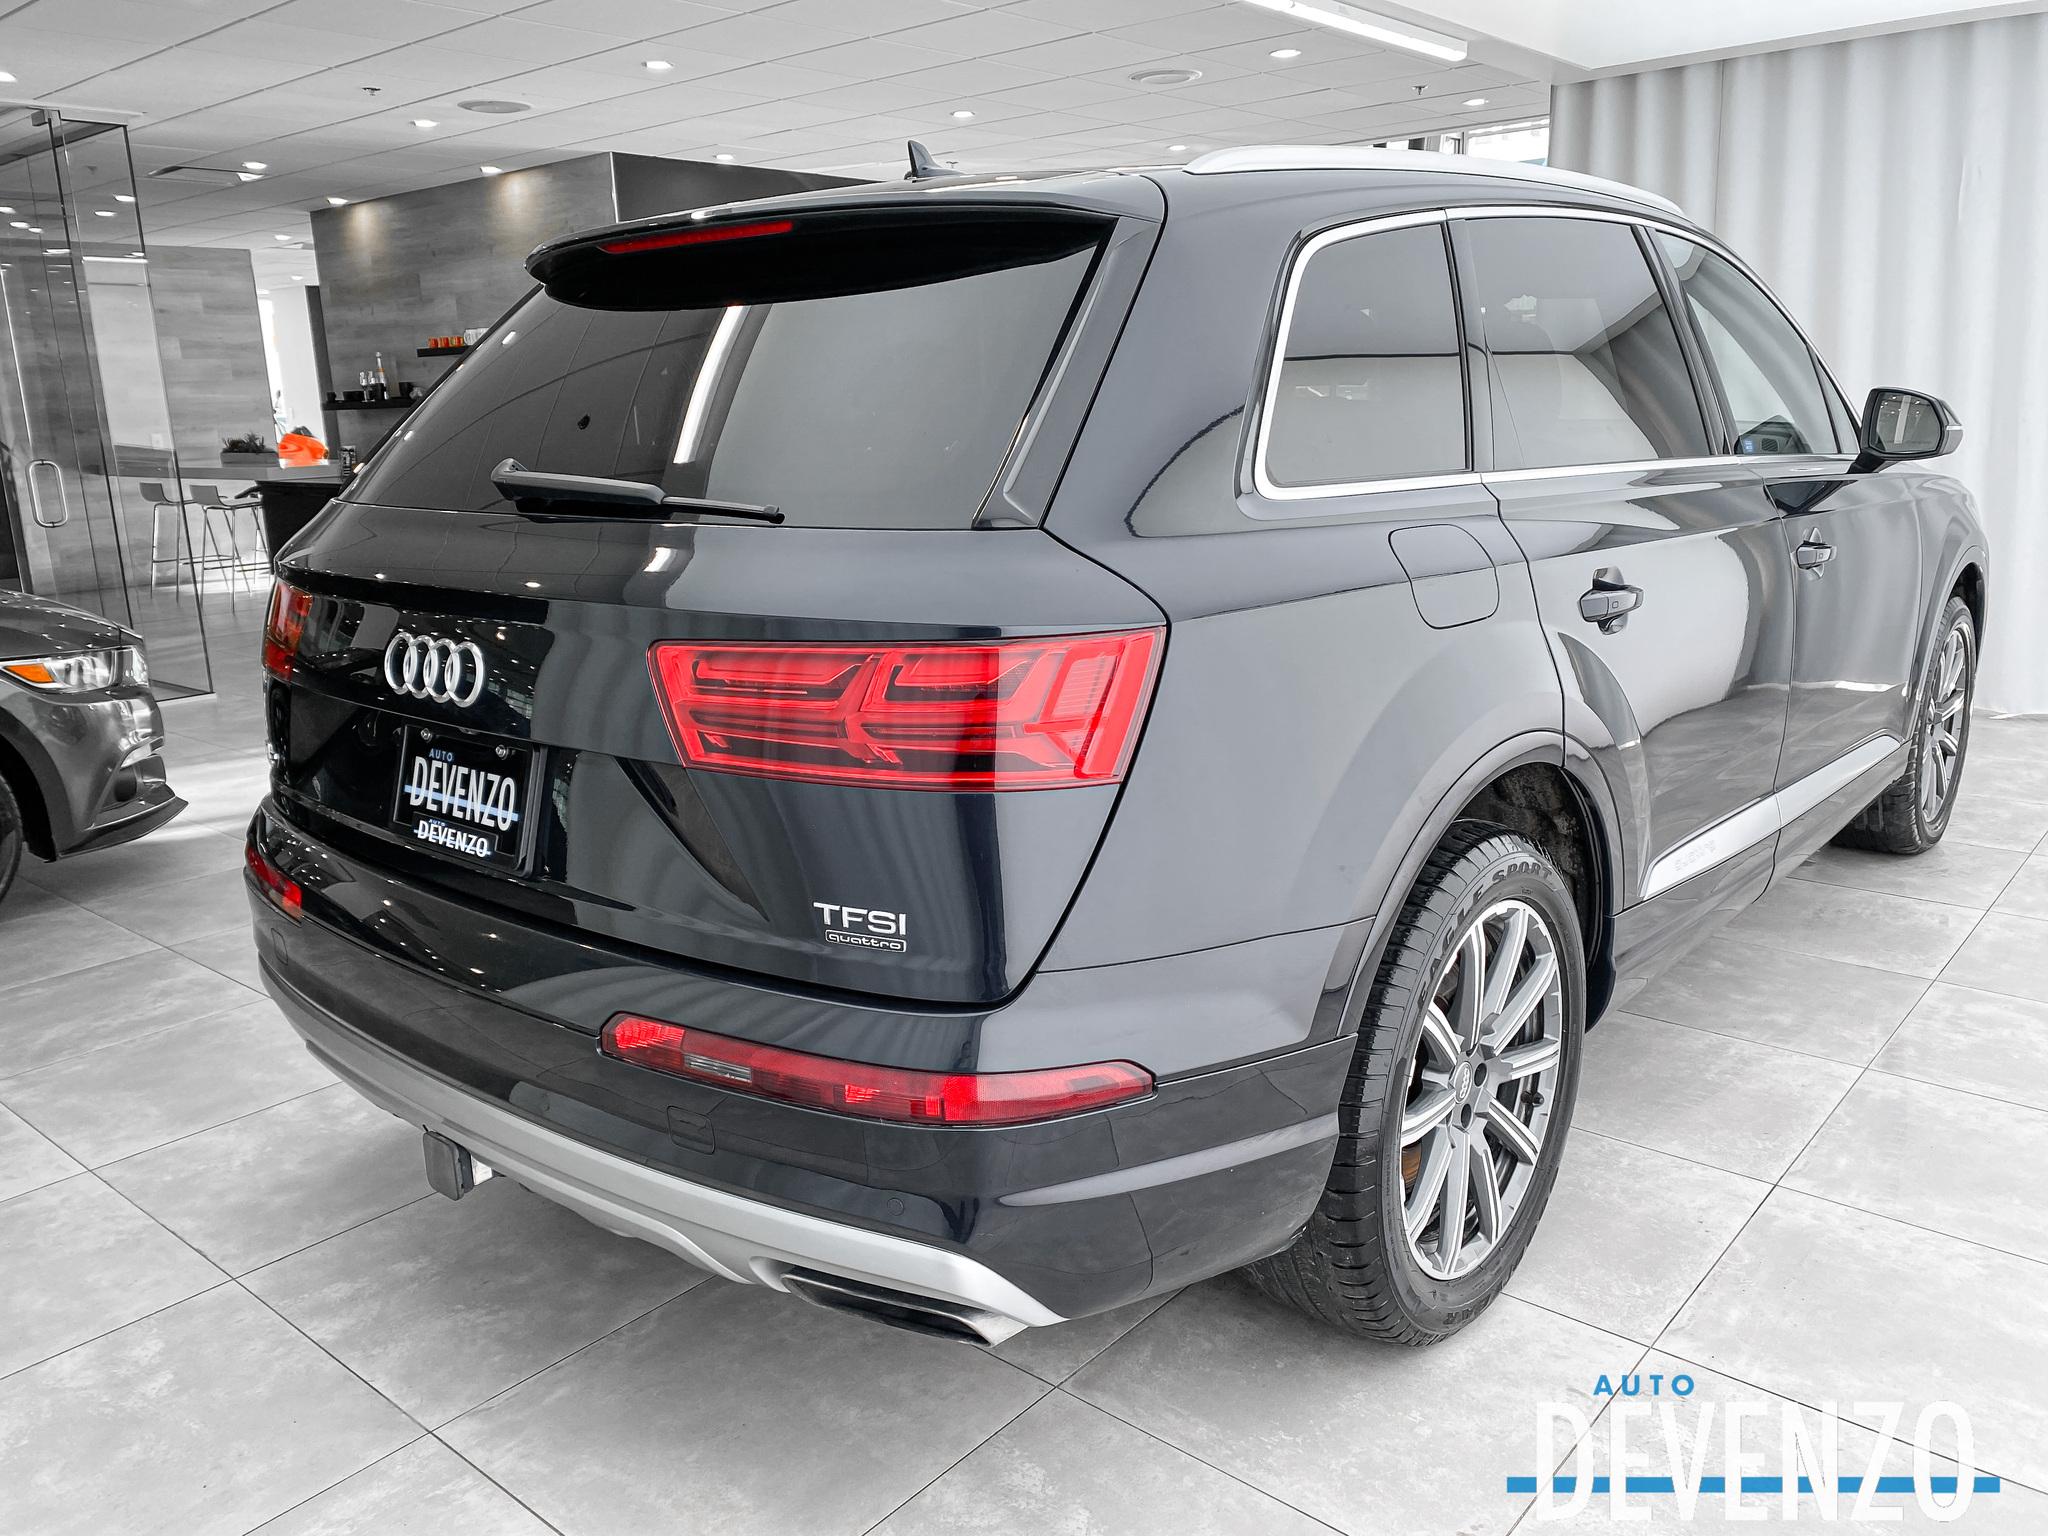 2017 Audi Q7 Quattro 3.0T Progressiv Navi / Toit Pano / Camera complet